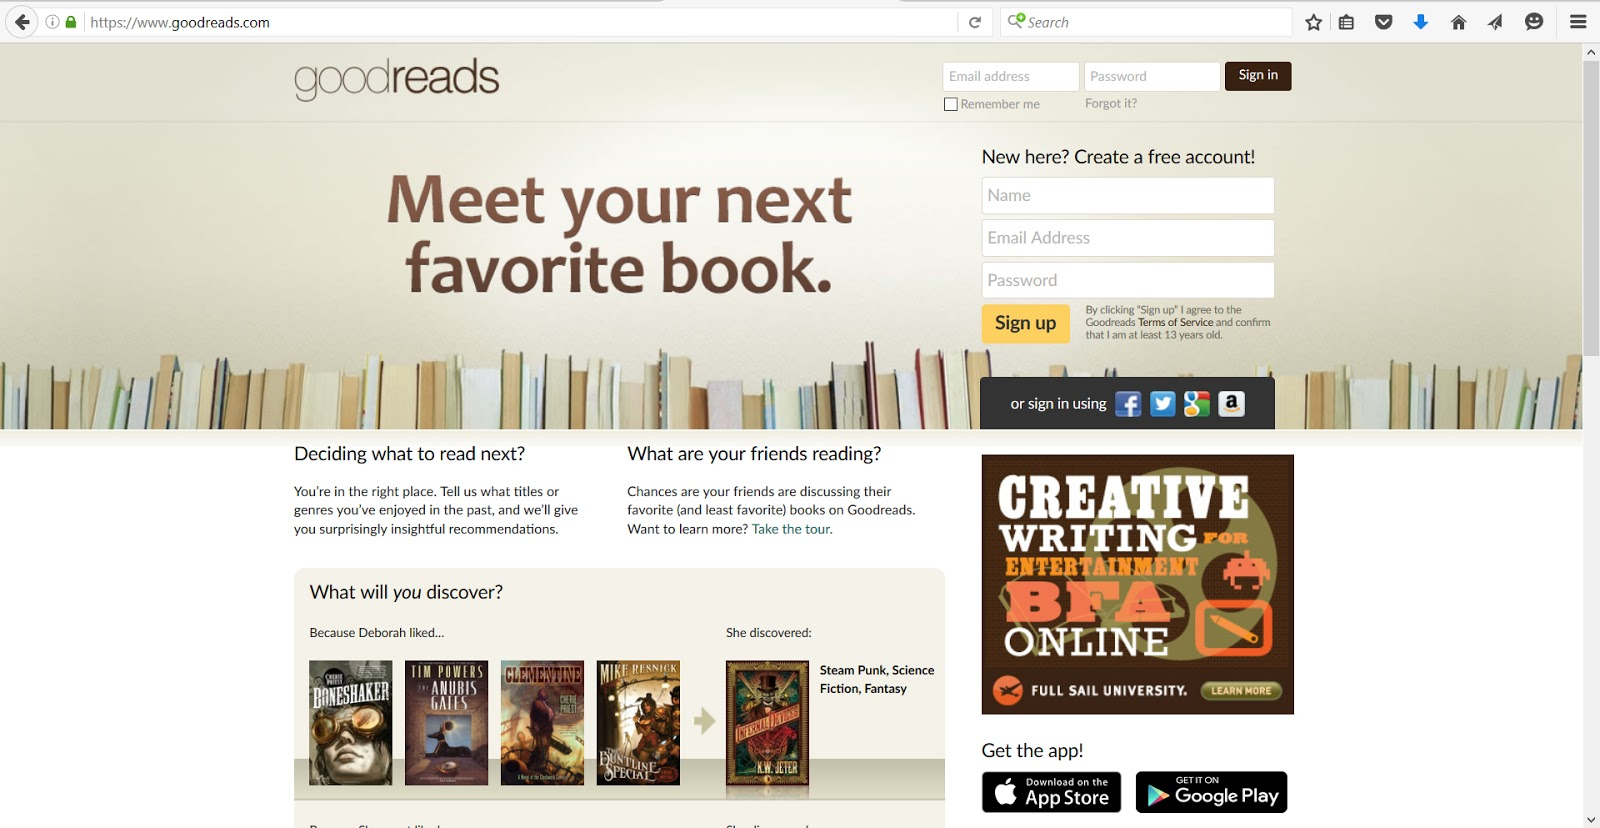 Jo Michaels Blog: Goodreads Demystified